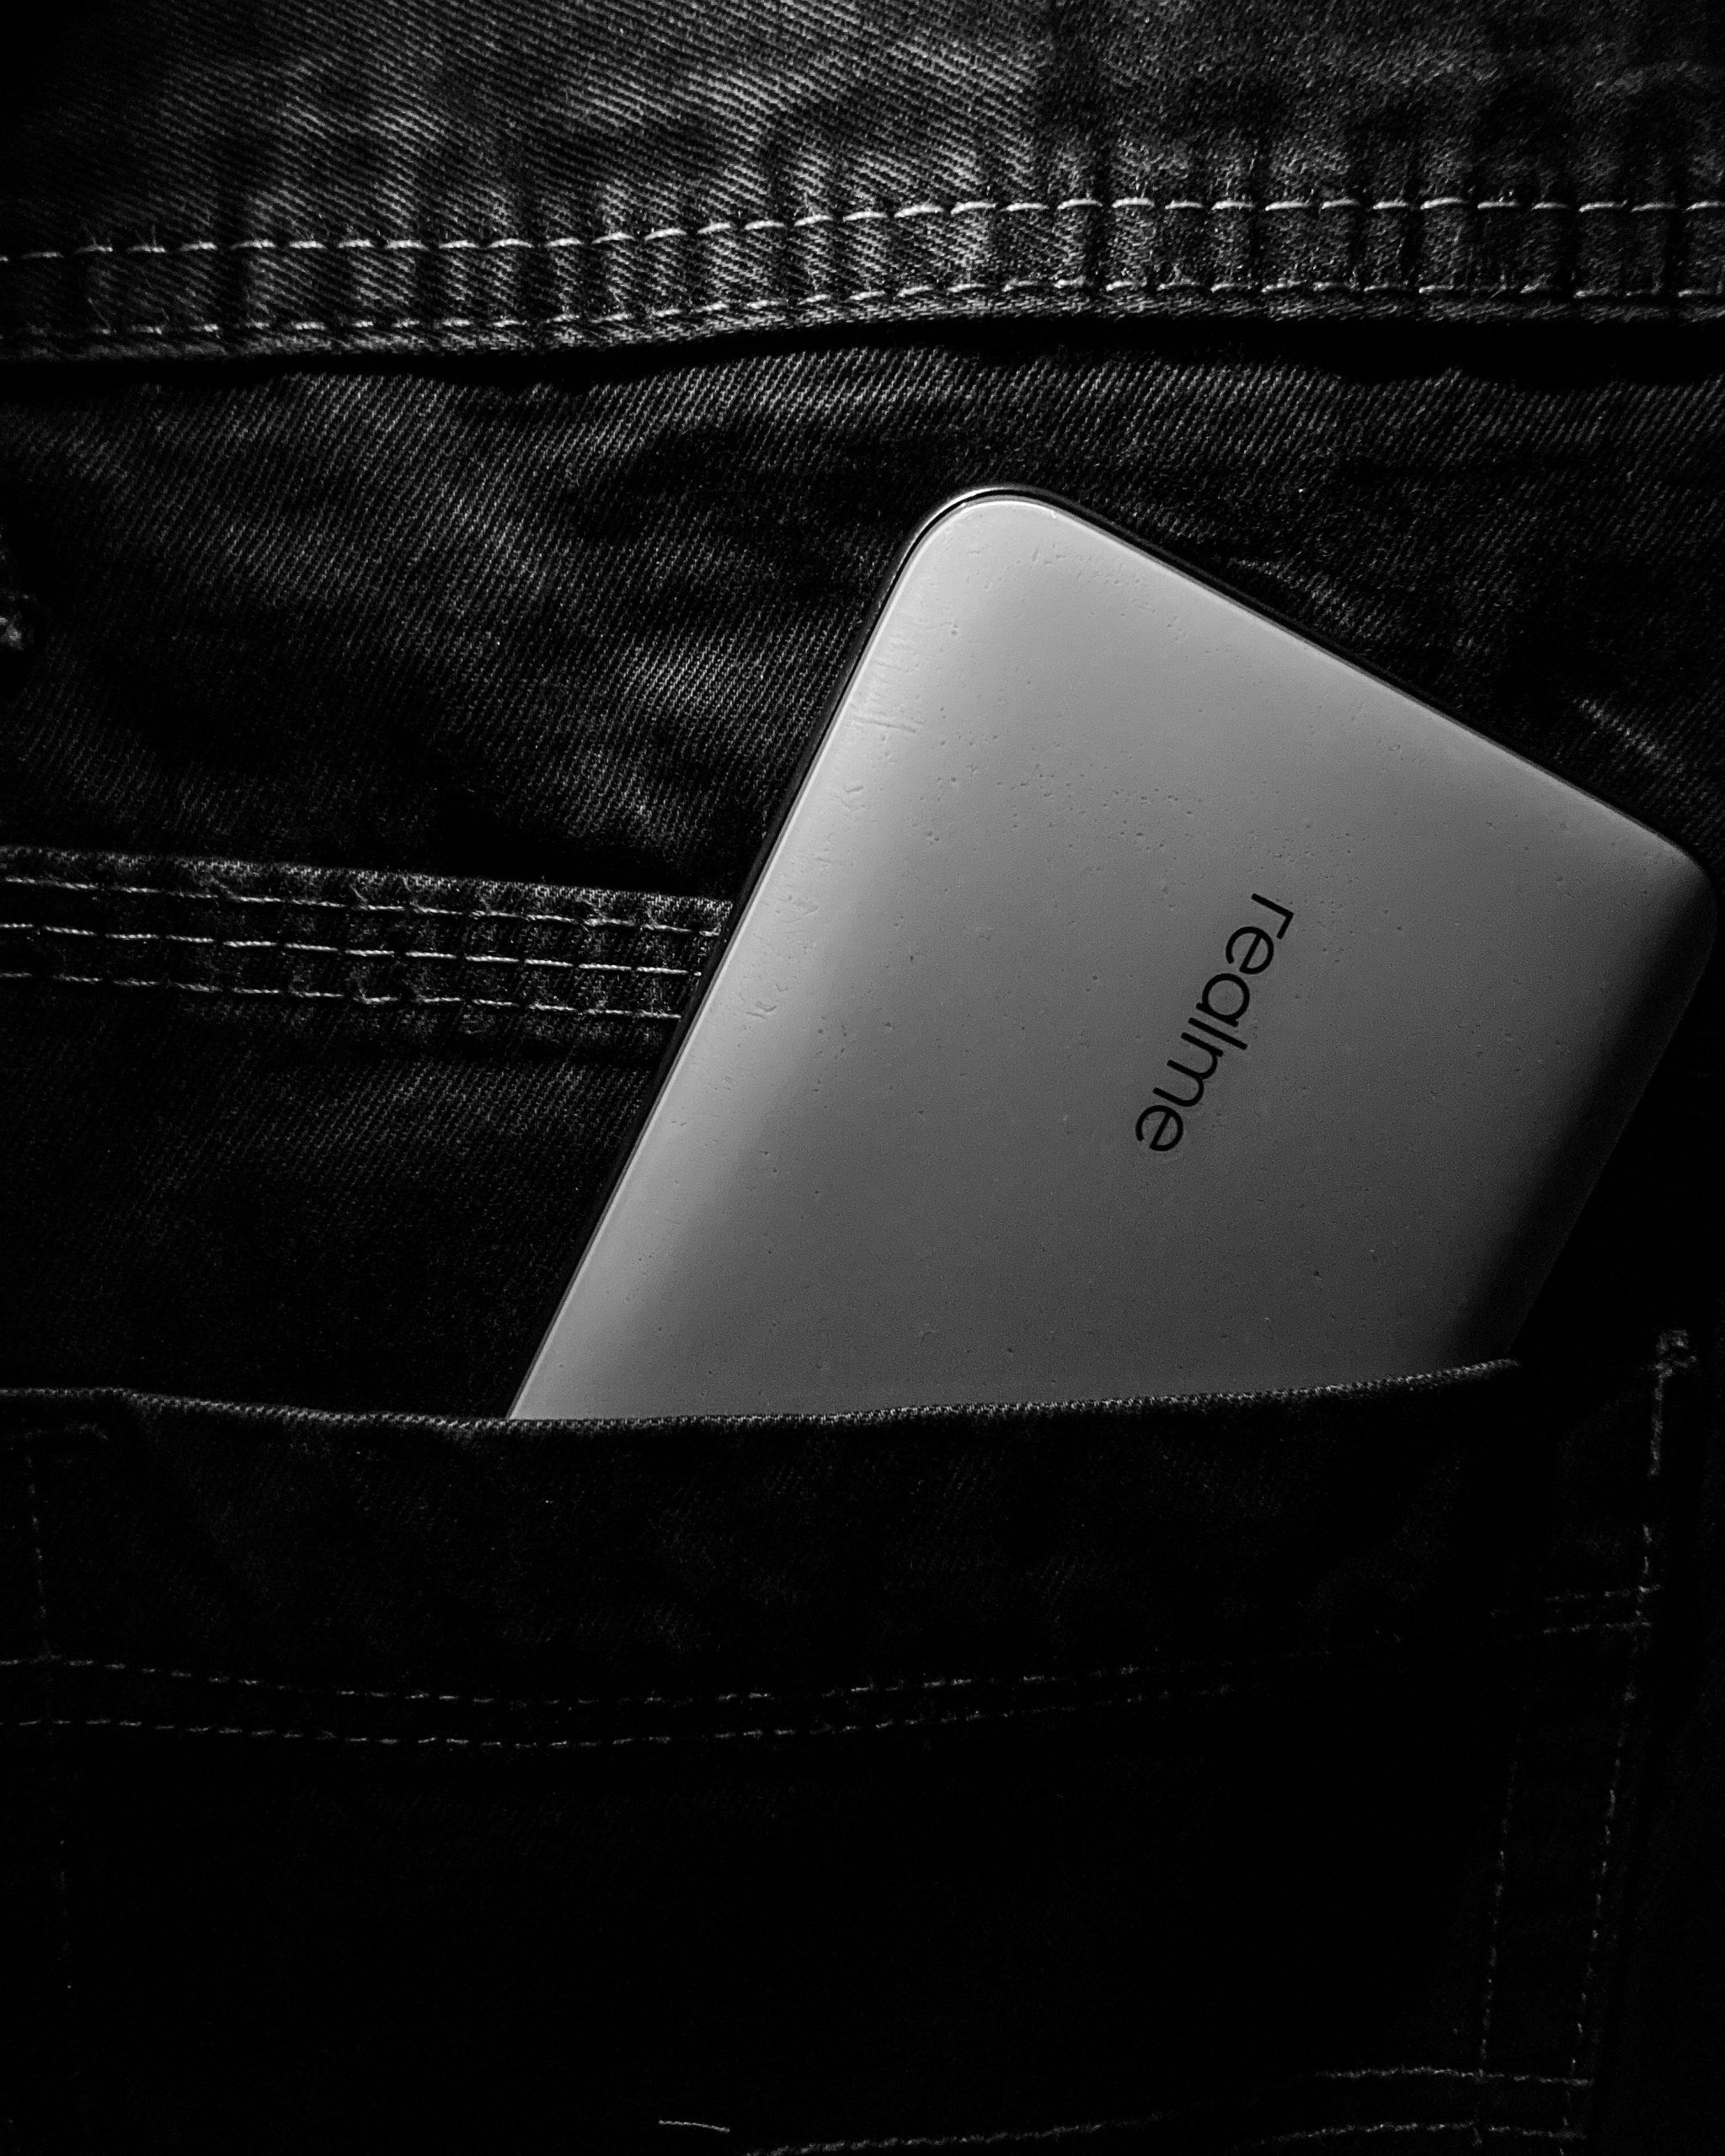 Realme Phone in the Pocket